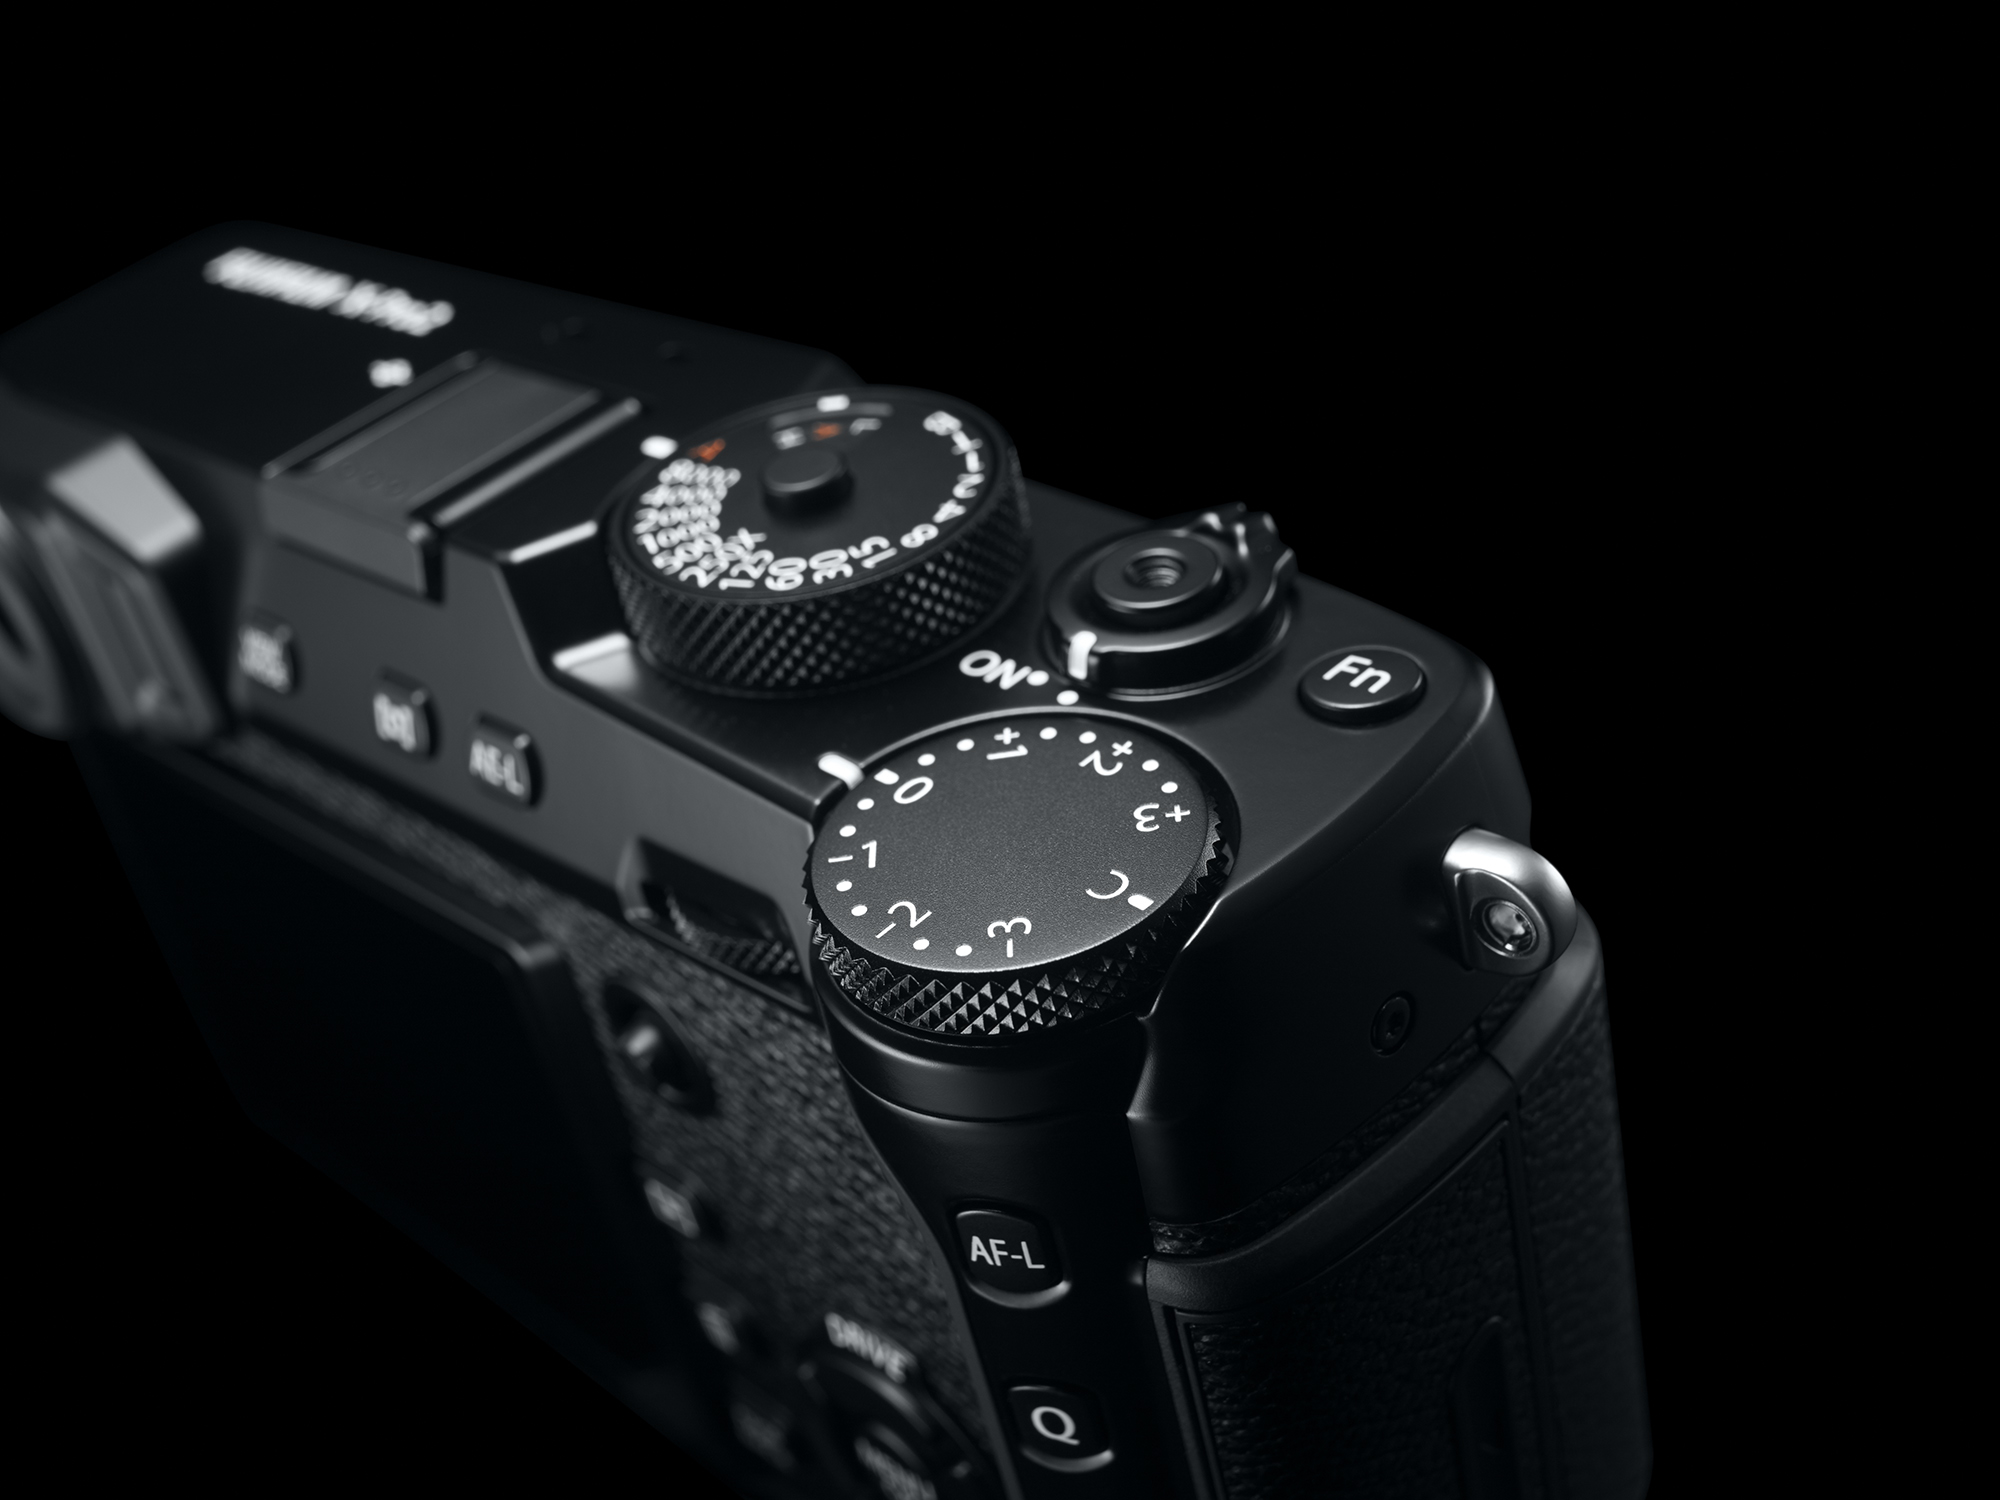 Fujifilm_X Pro2_BK_EV_Conpensation_Dial